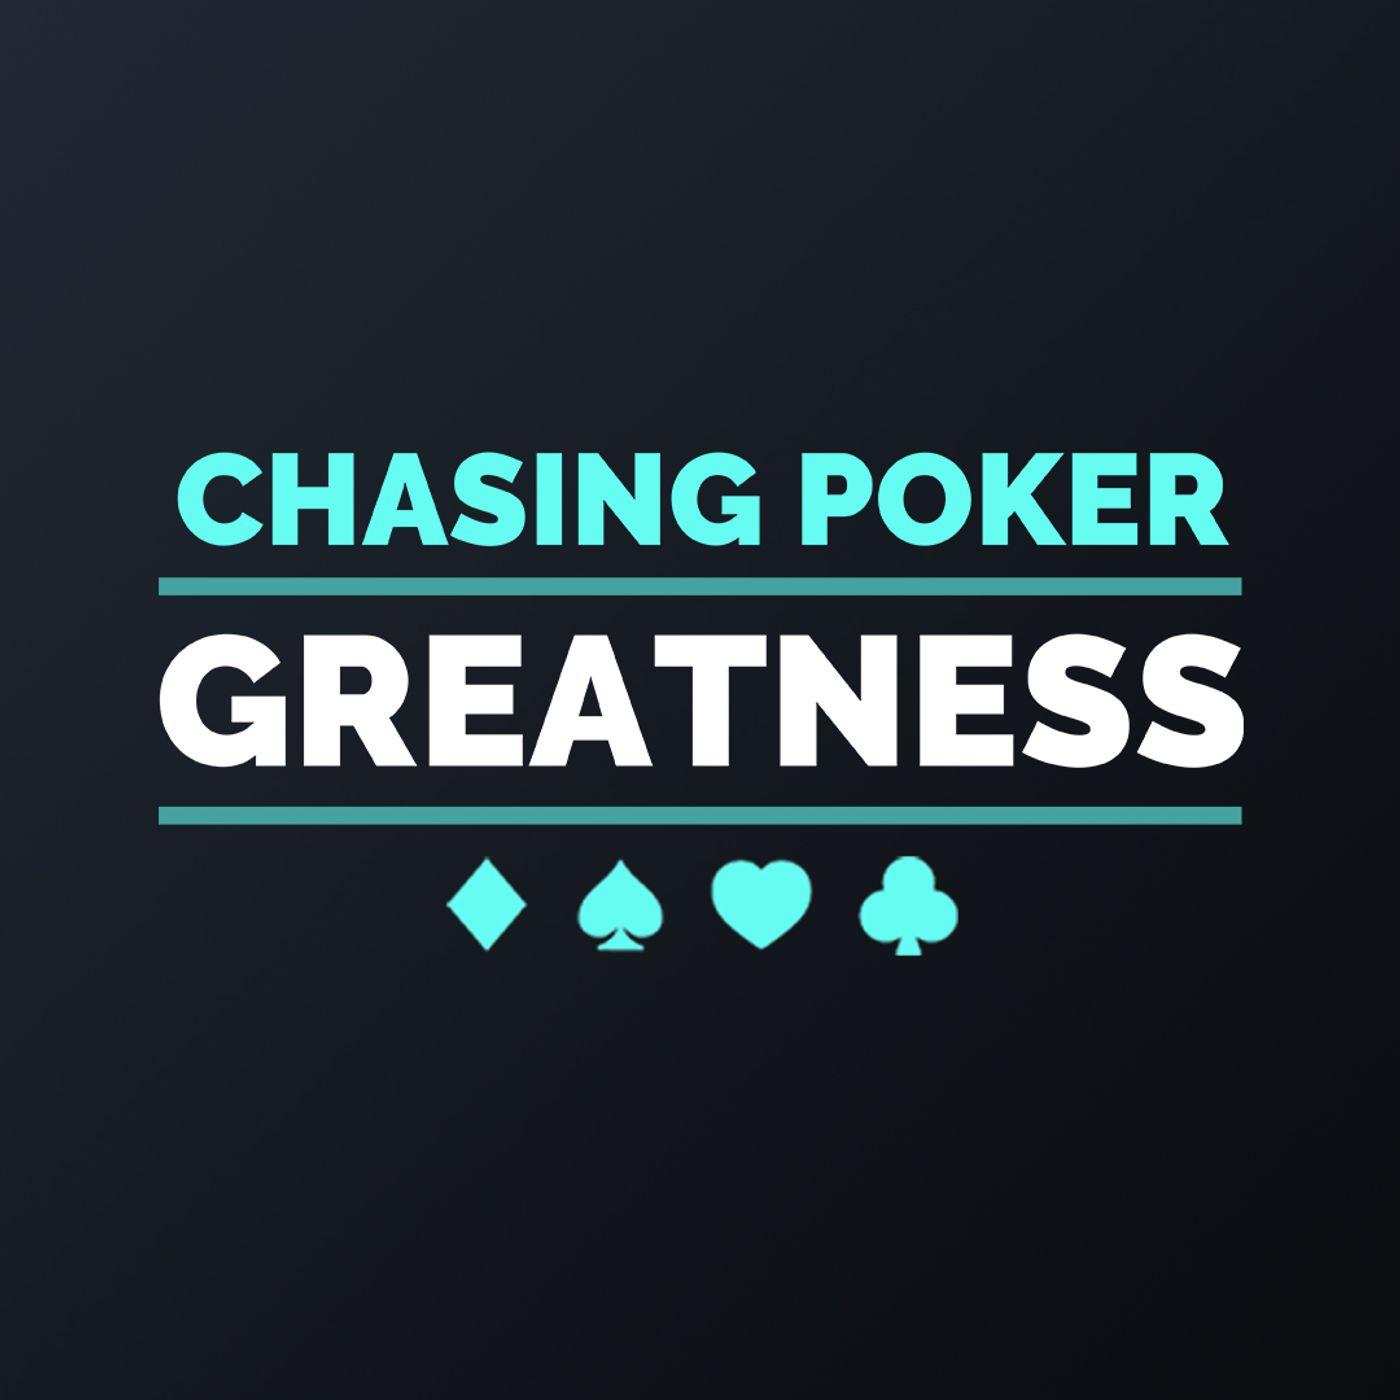 #4 CPG Villagers: Longtime High Level Poker Pro